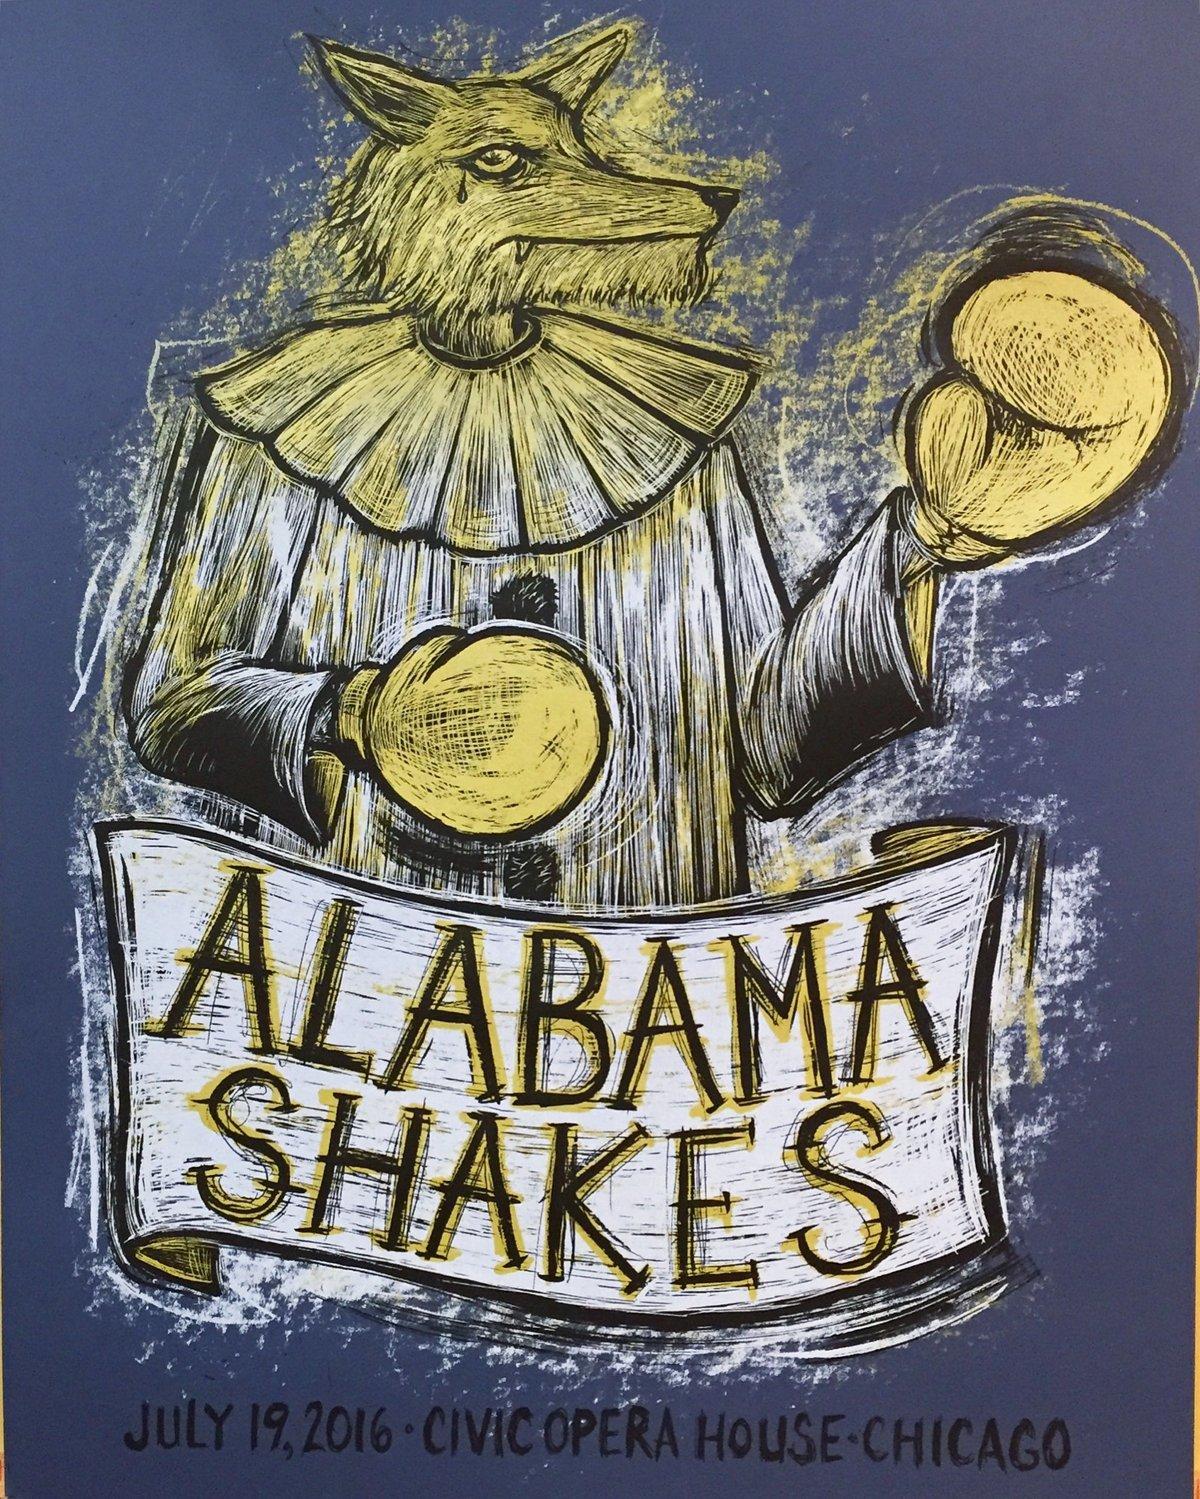 Alabama Shakes Civic Opera House